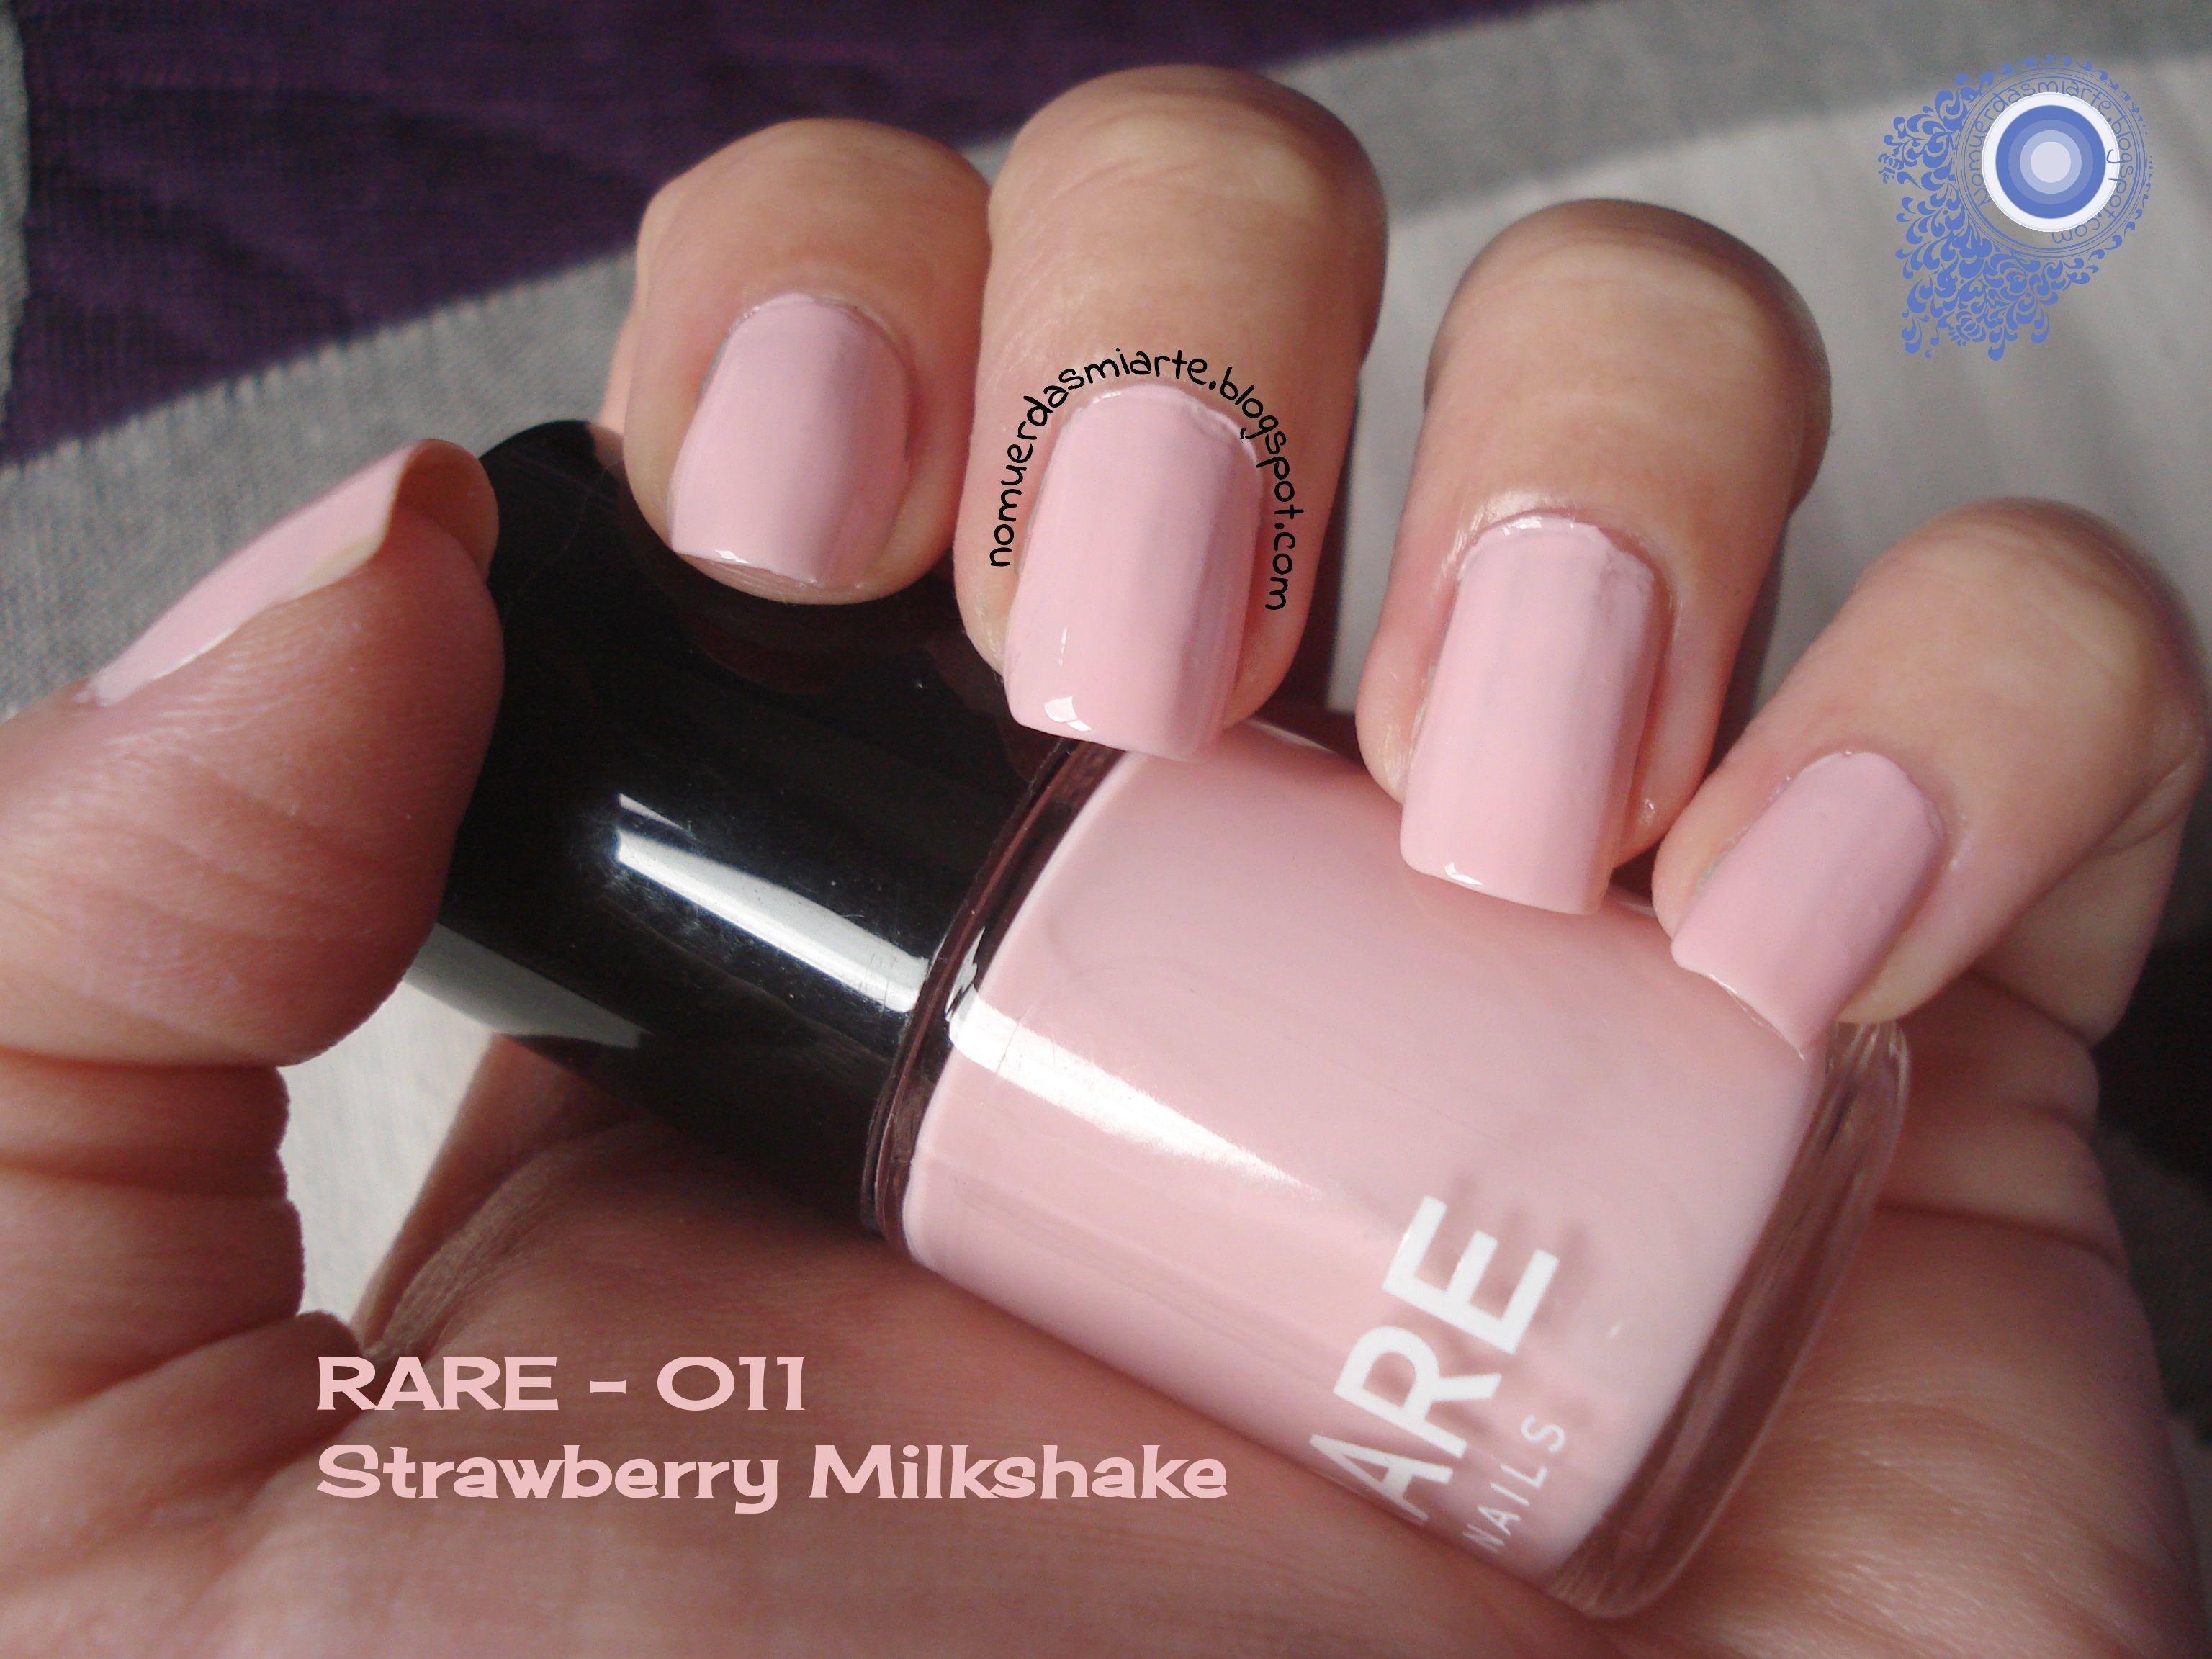 RARE - 011 Strawberry Milkshake (2 coats, no top coat) #nails ...